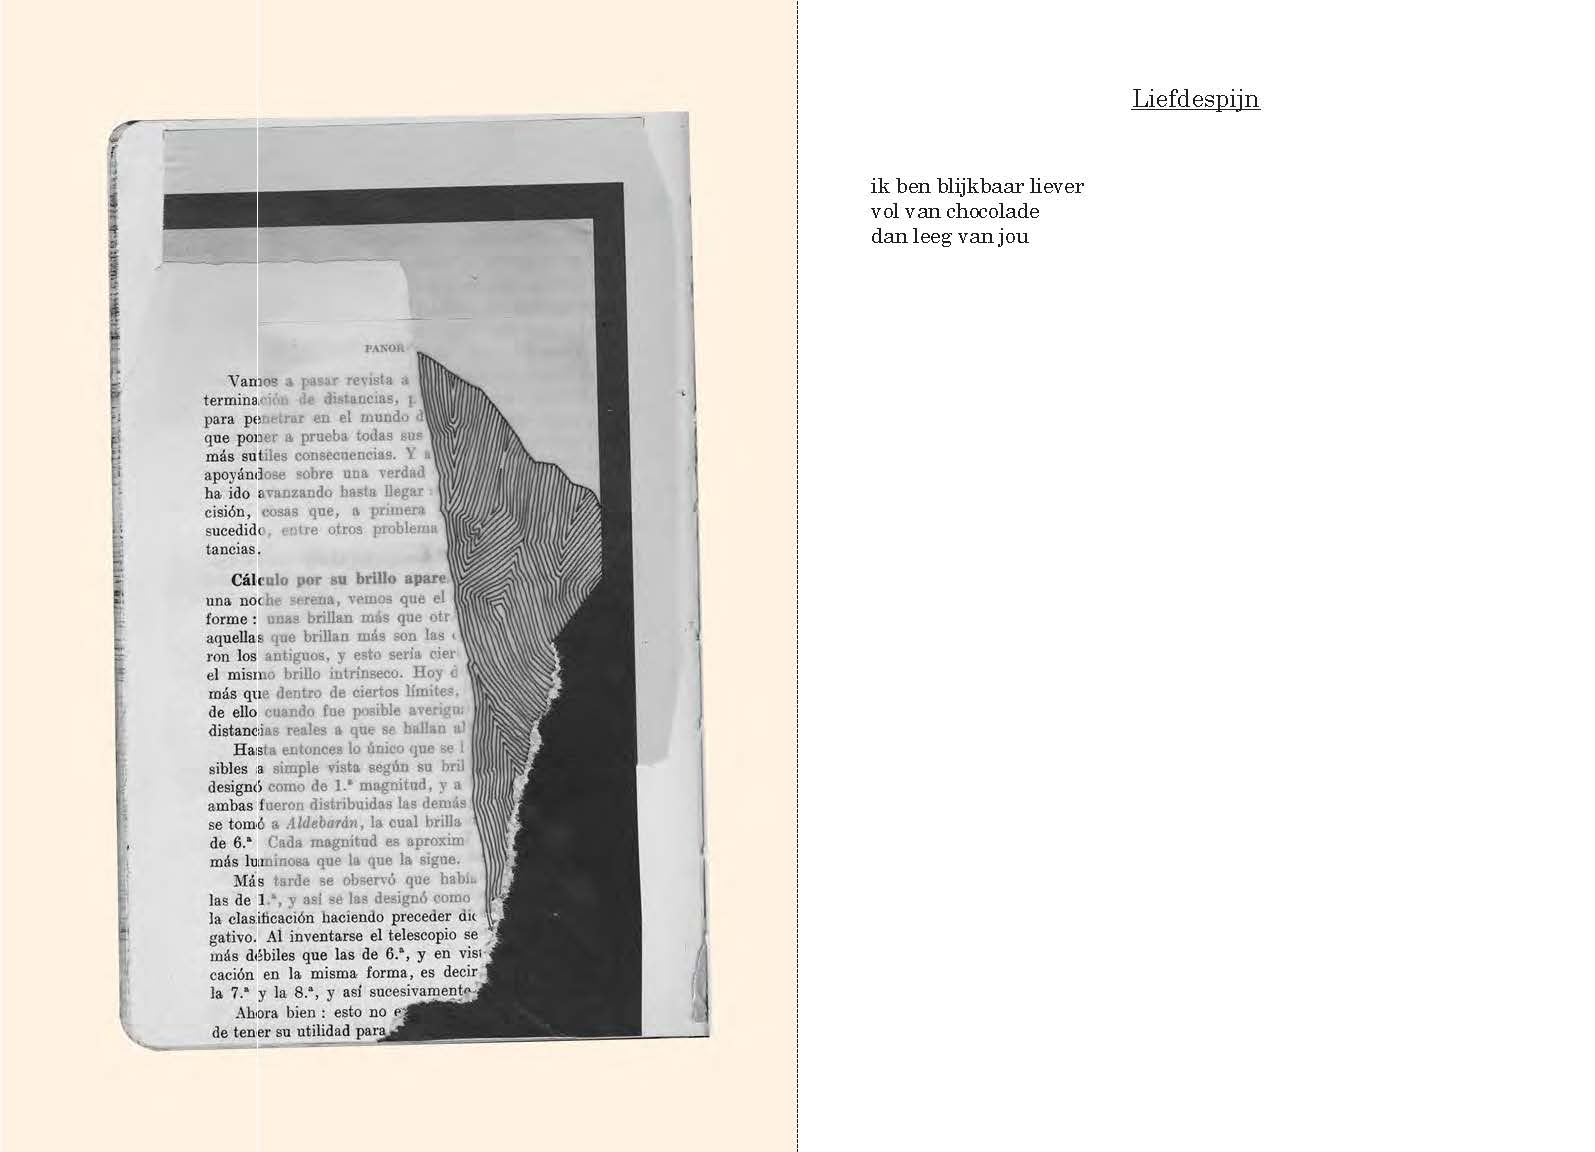 Manuscript-Selfie-YildauterBeek-Lang_Pagina_31.jpg